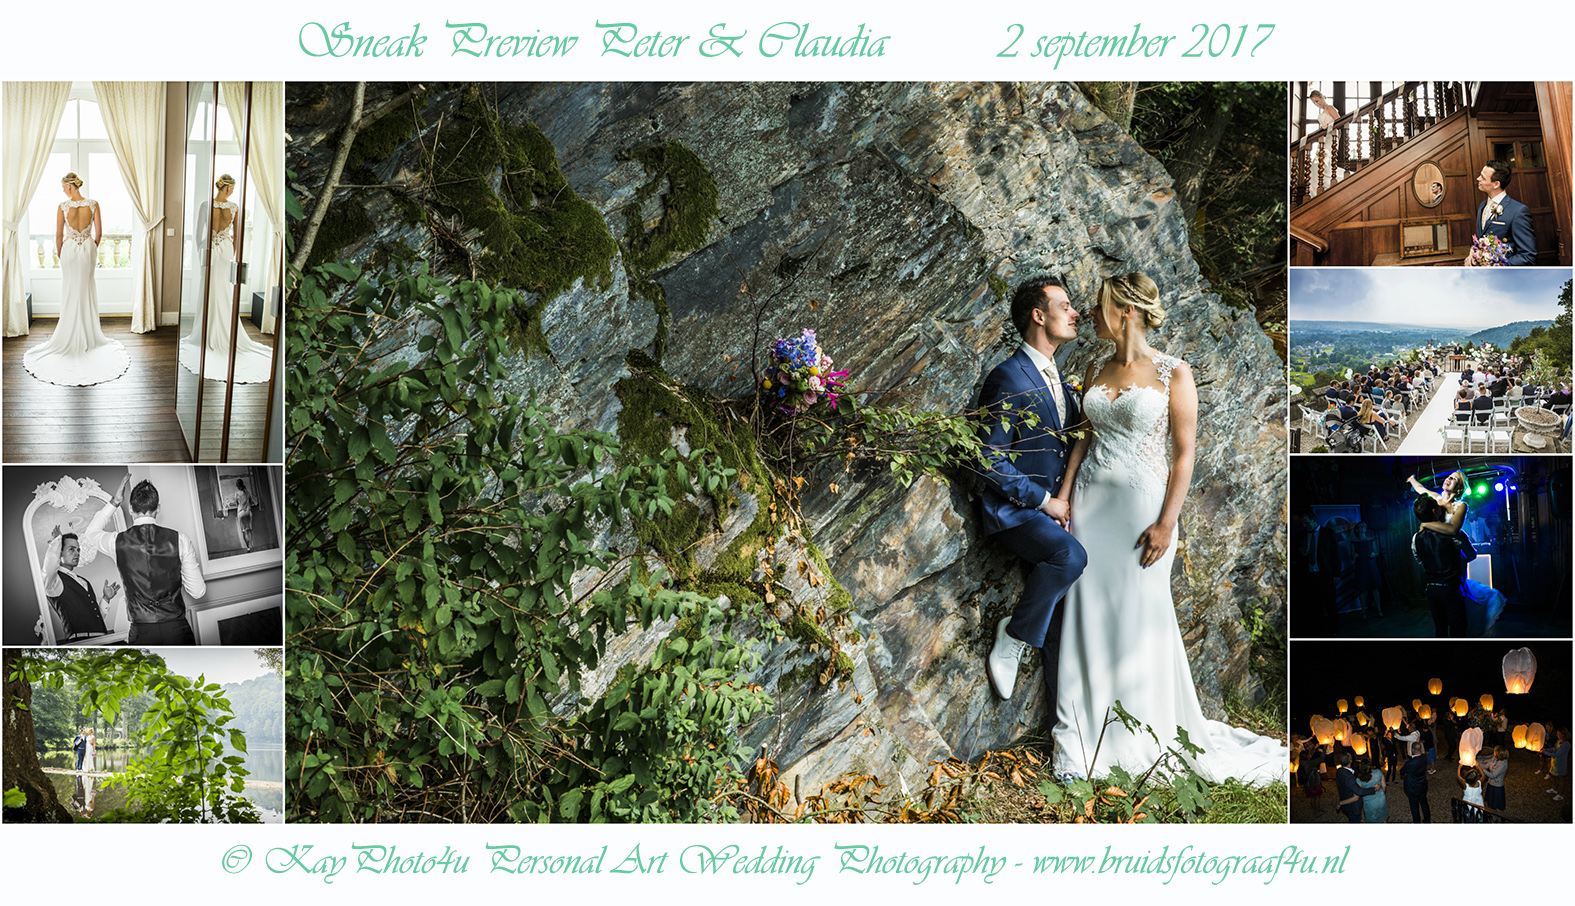 le chateau de balmoral, wedding chateau de balmoral, chateau de balmoral, wedding spa, trouwen belgië, trouwen spa, wedding spa, KayPhoto4u, bruidsfotograaf4u.nl, bruidsfotograaf4u